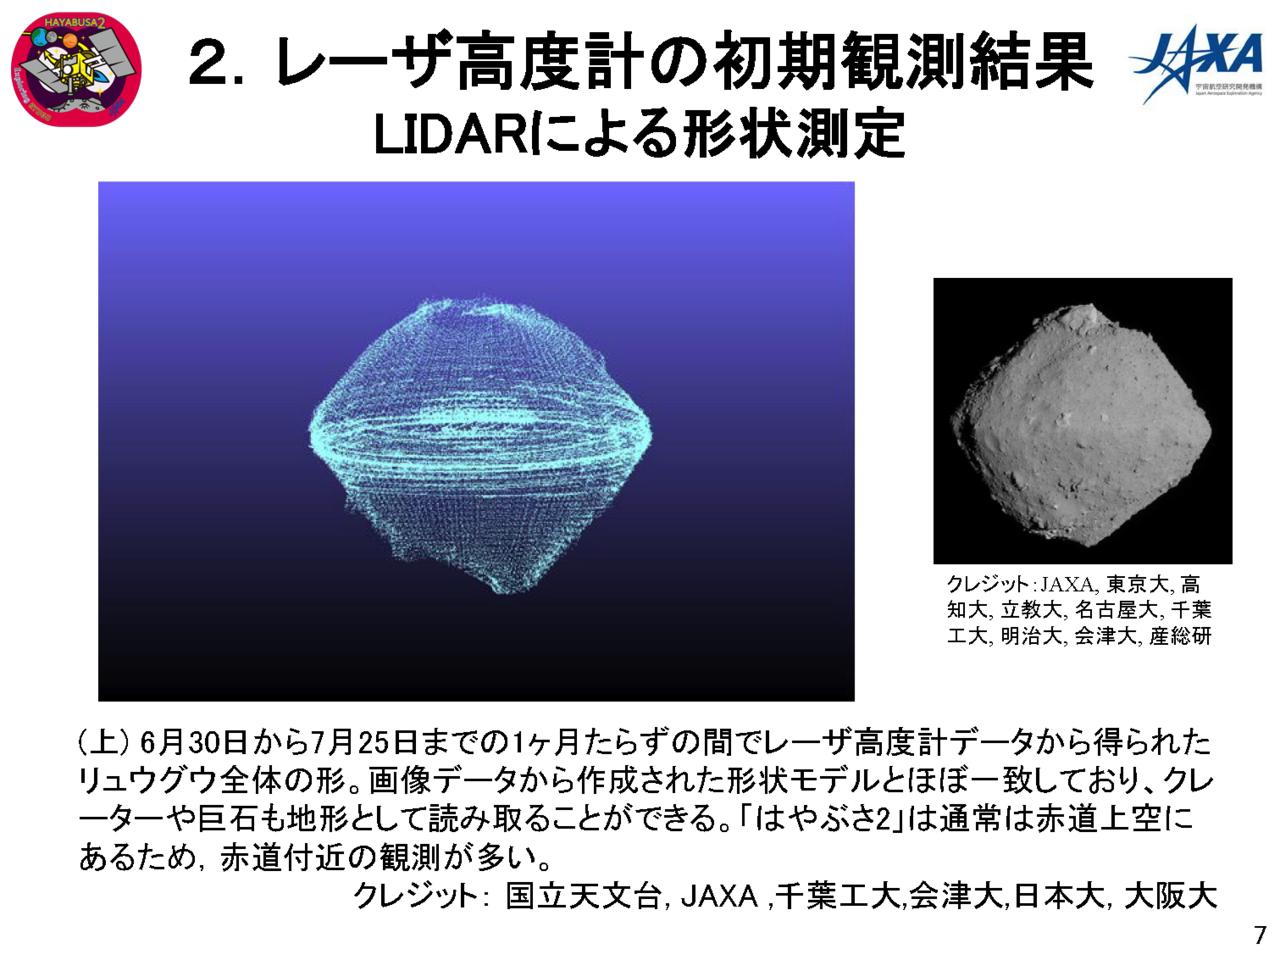 f:id:Imamura:20180802145927p:plain